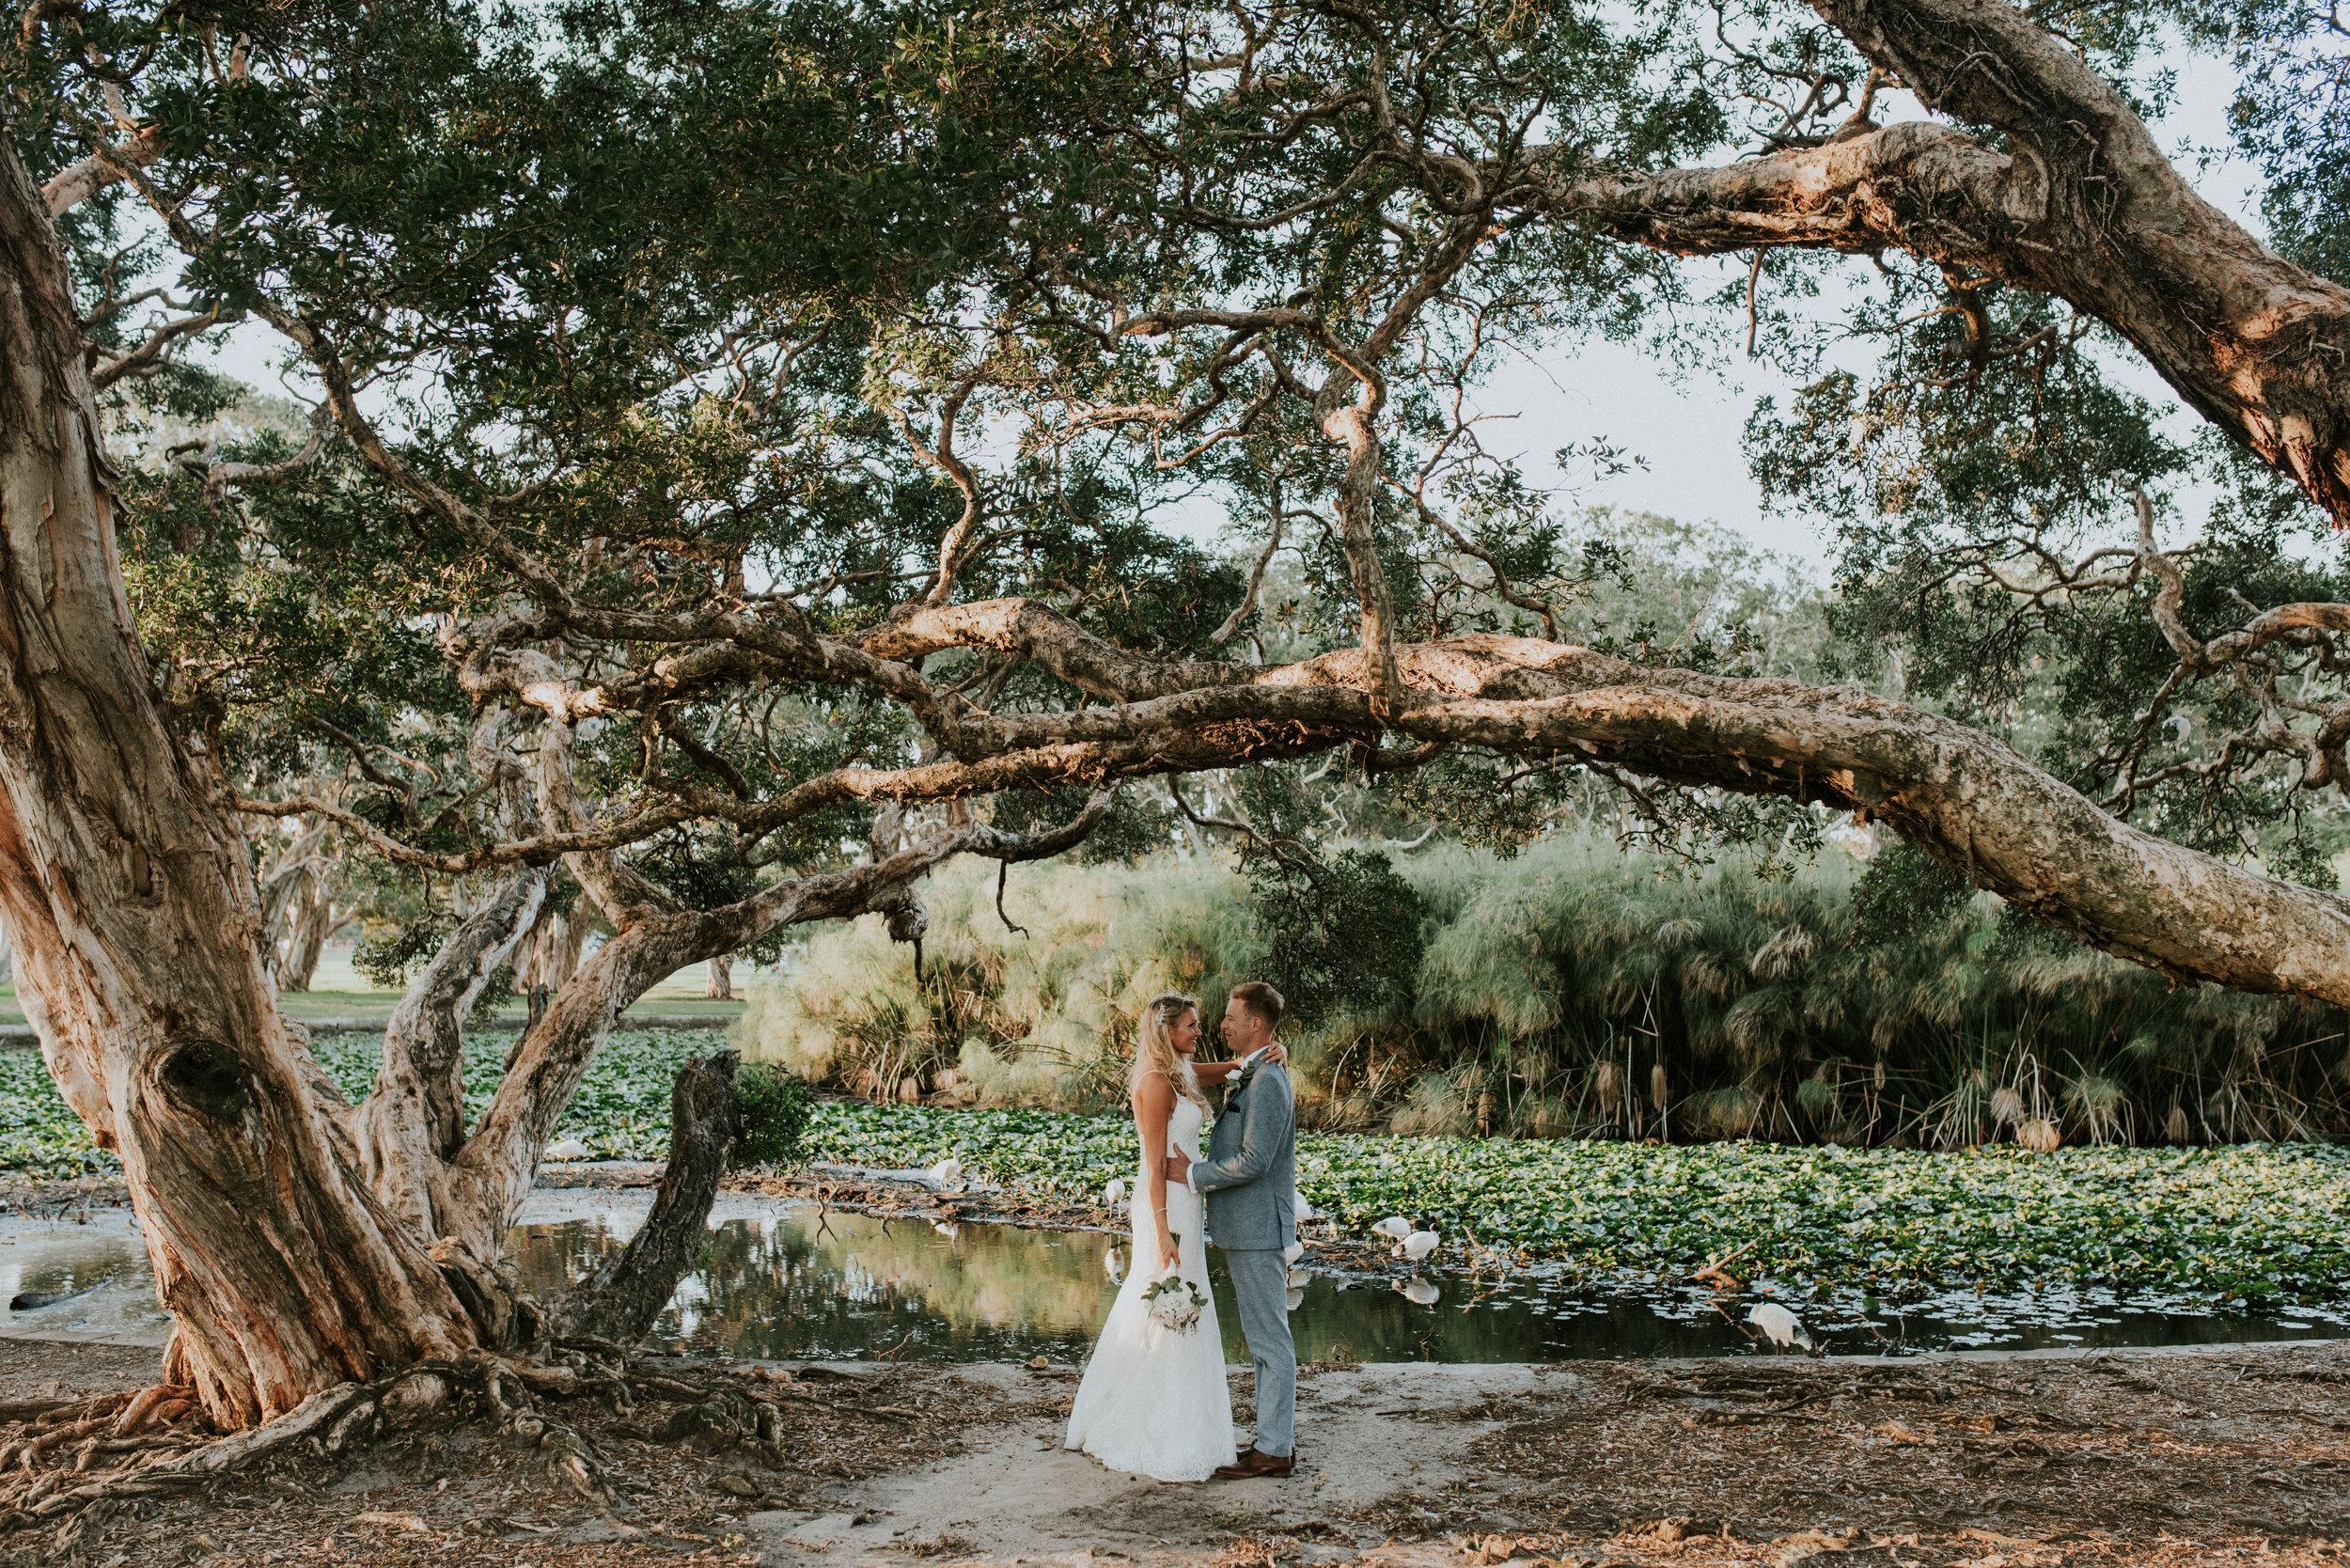 Hes & Styve - Centennial Parklands, Sydney Cocktail Wedding    7th April 2018